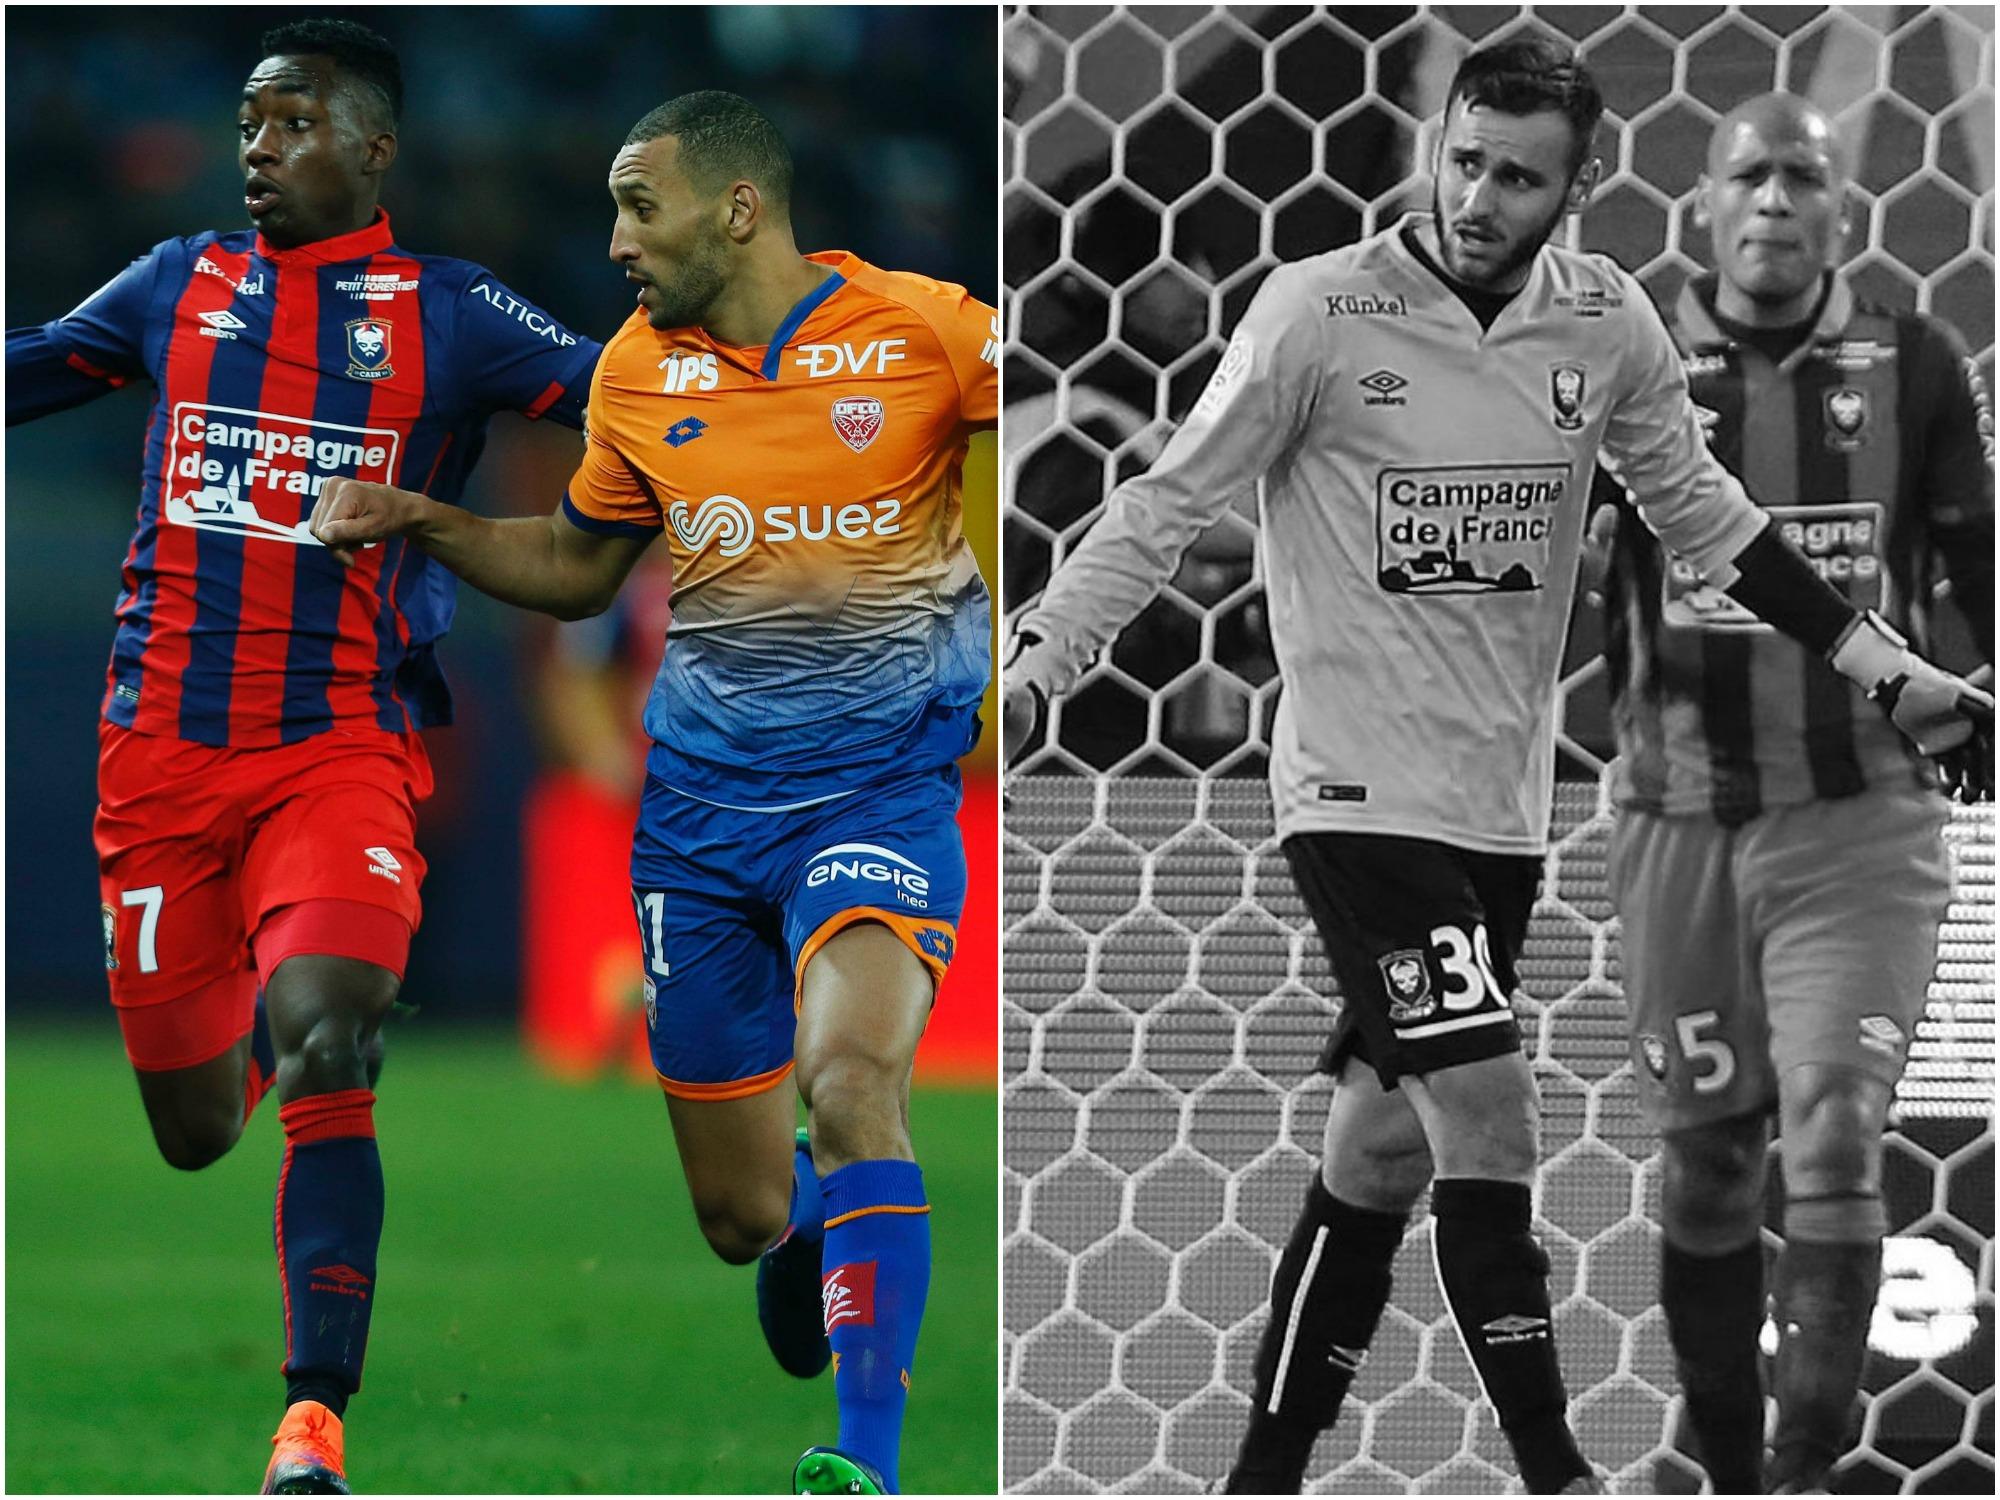 Football - Ligue 1 - Tops/Flops Caen-Dijon : la promesse Karamoh, l'erreur de Reulet